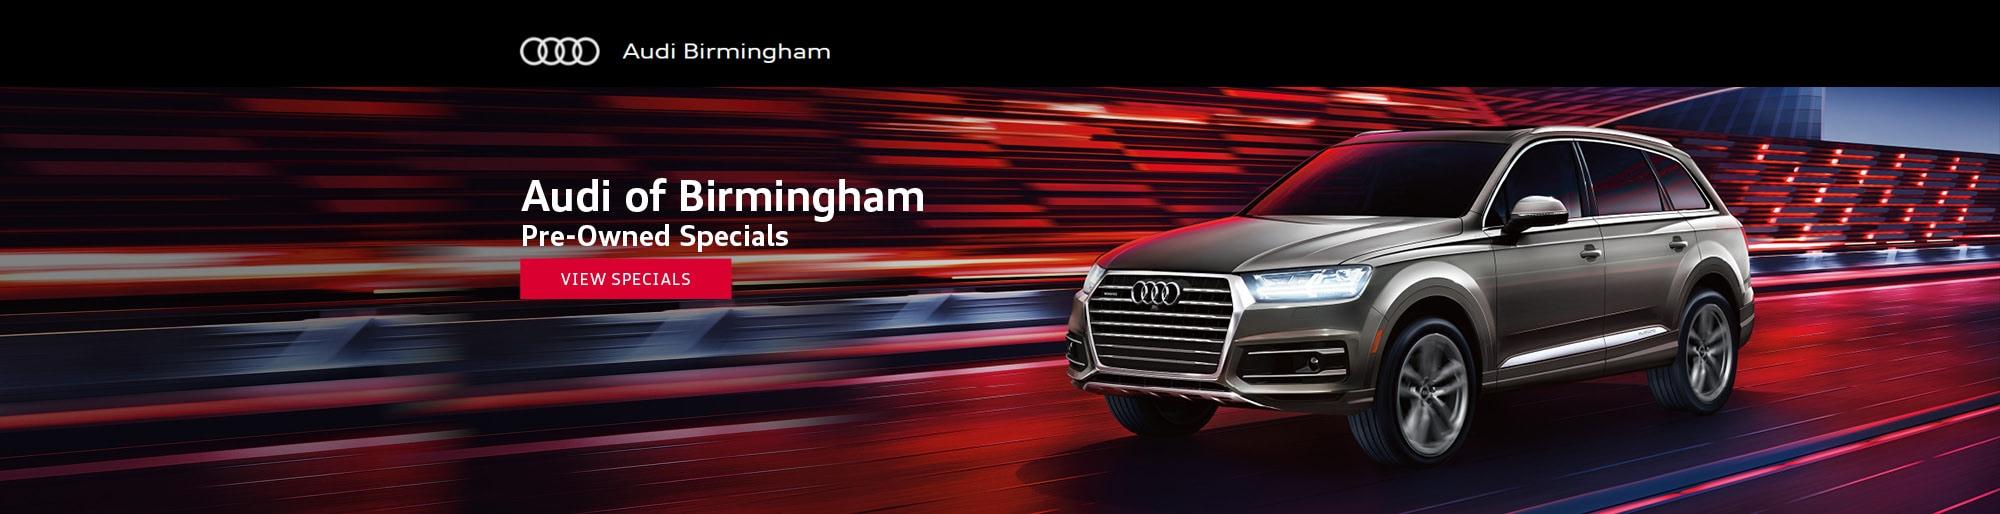 Audi Birmingham Luxury Car Dealership In Irondale Al